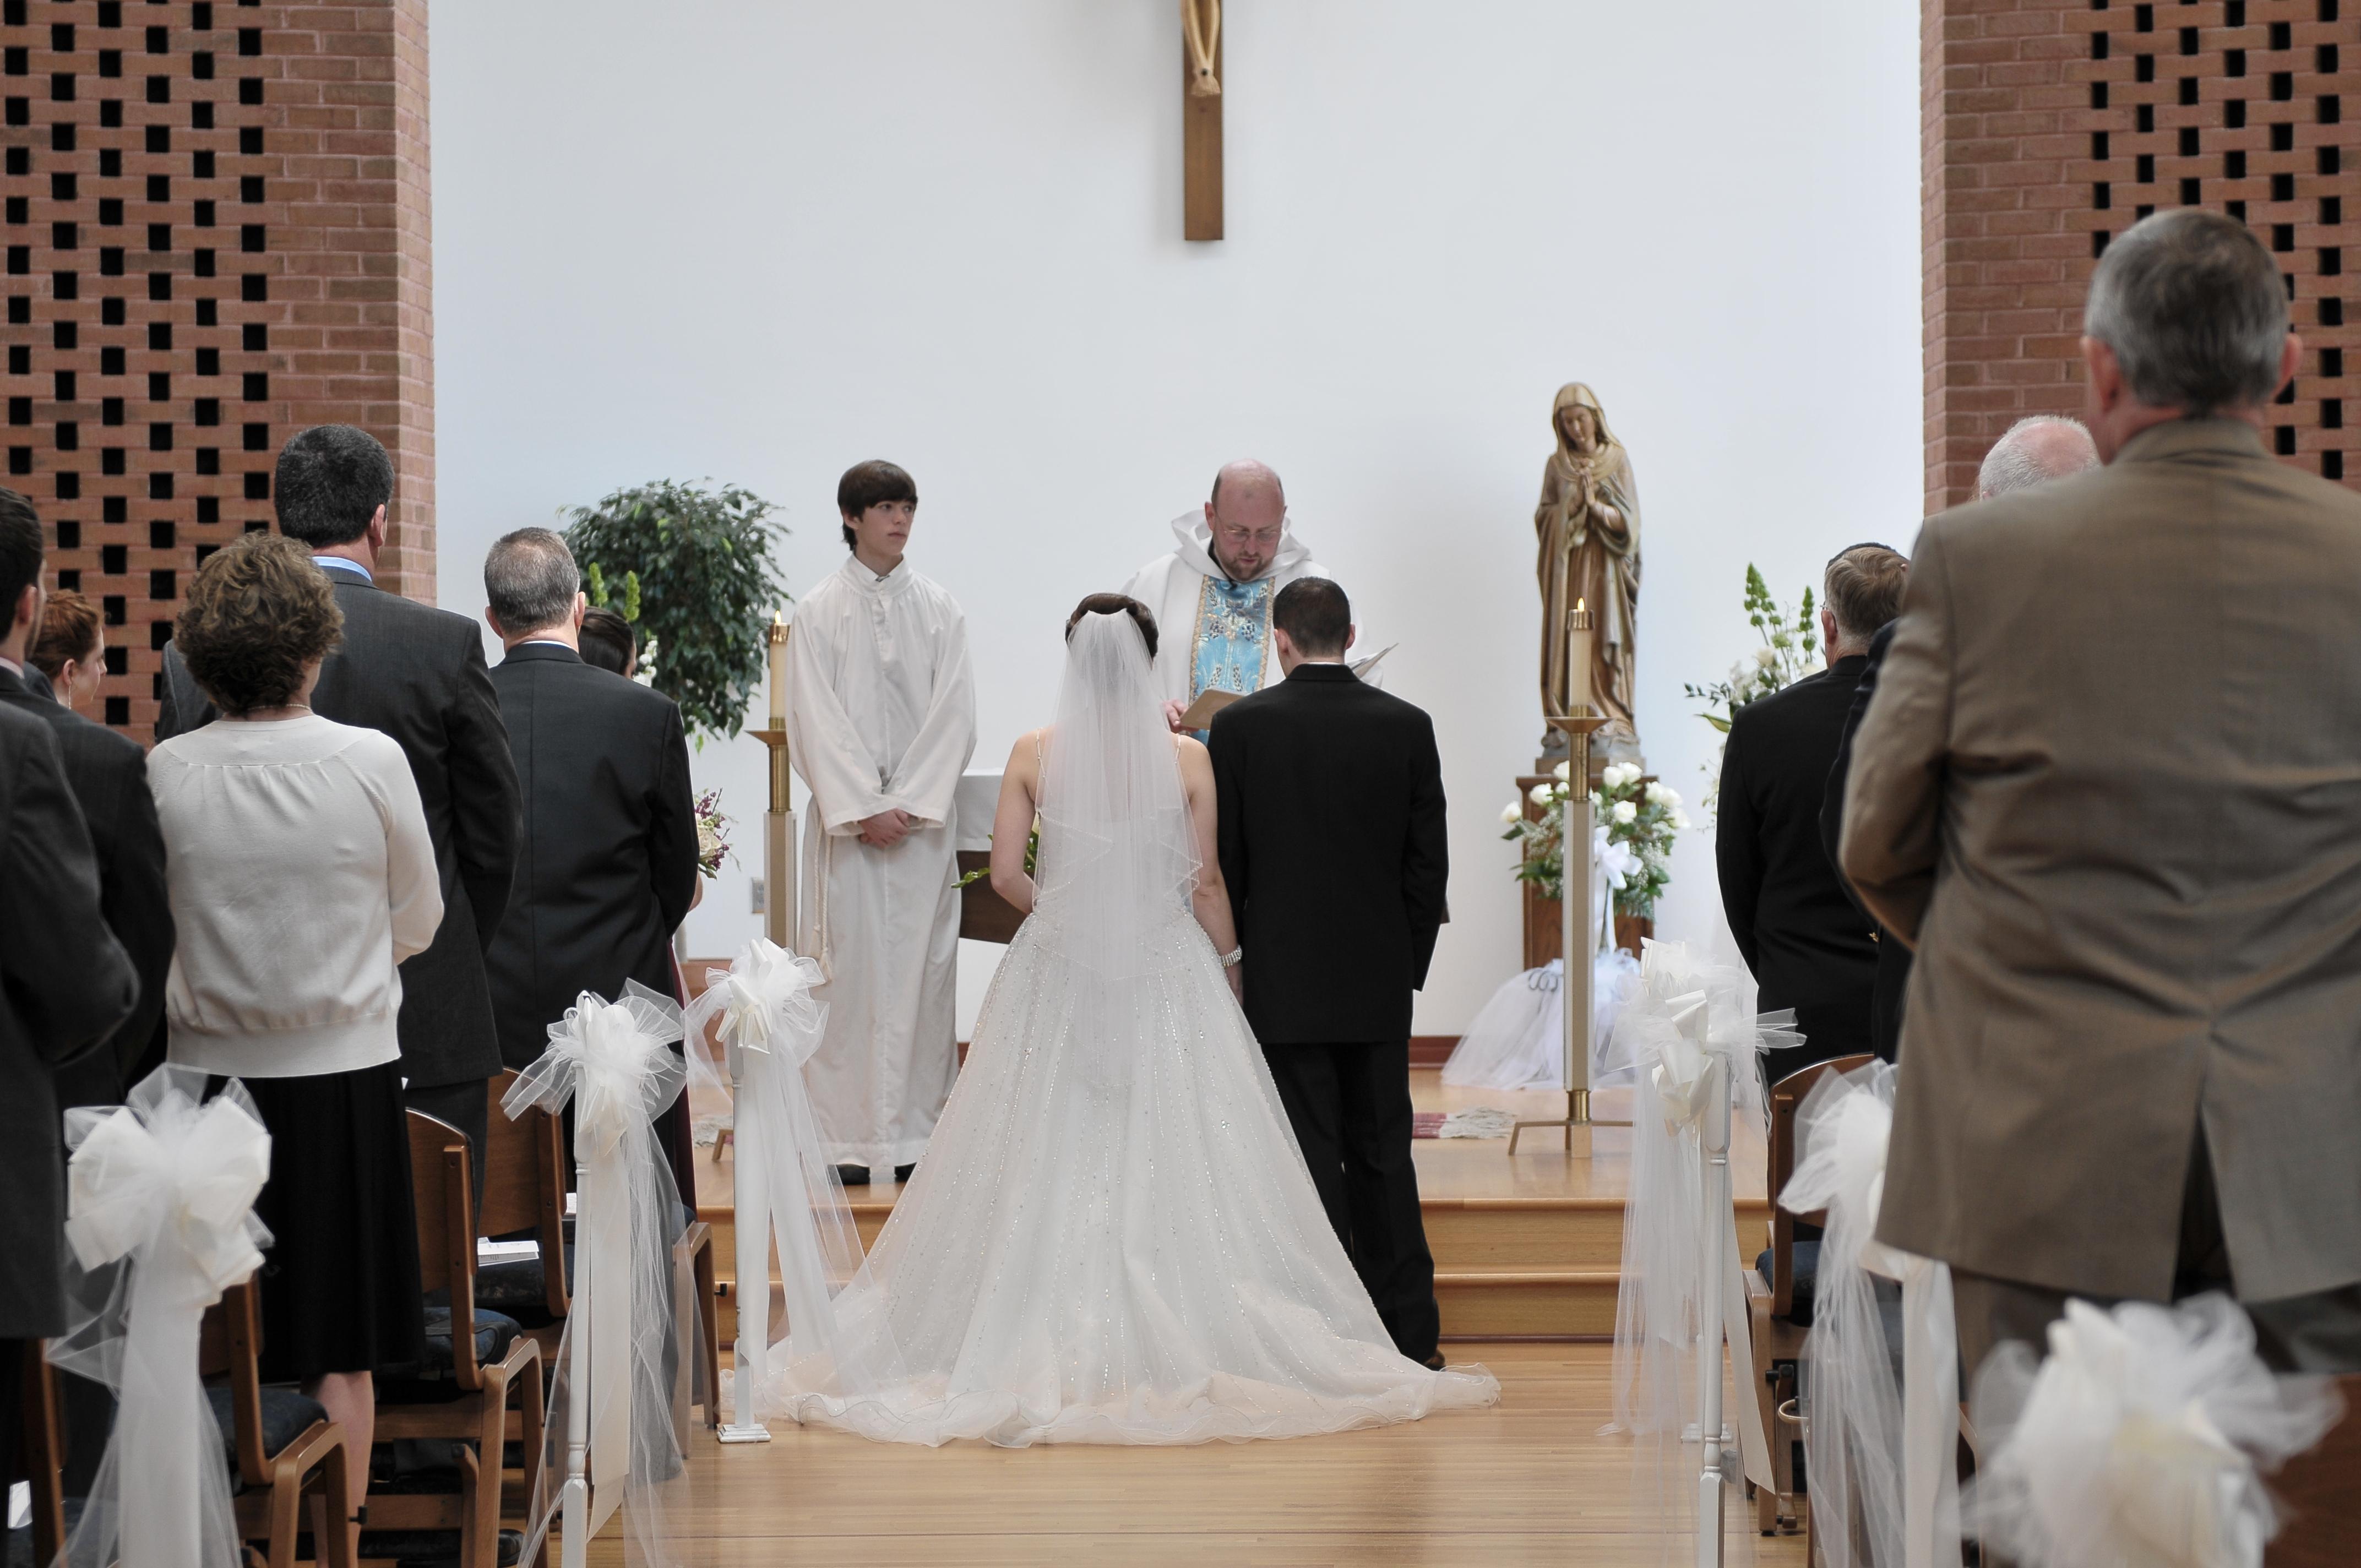 Matrimony Our Lady Of Good Counsel Catholic Church